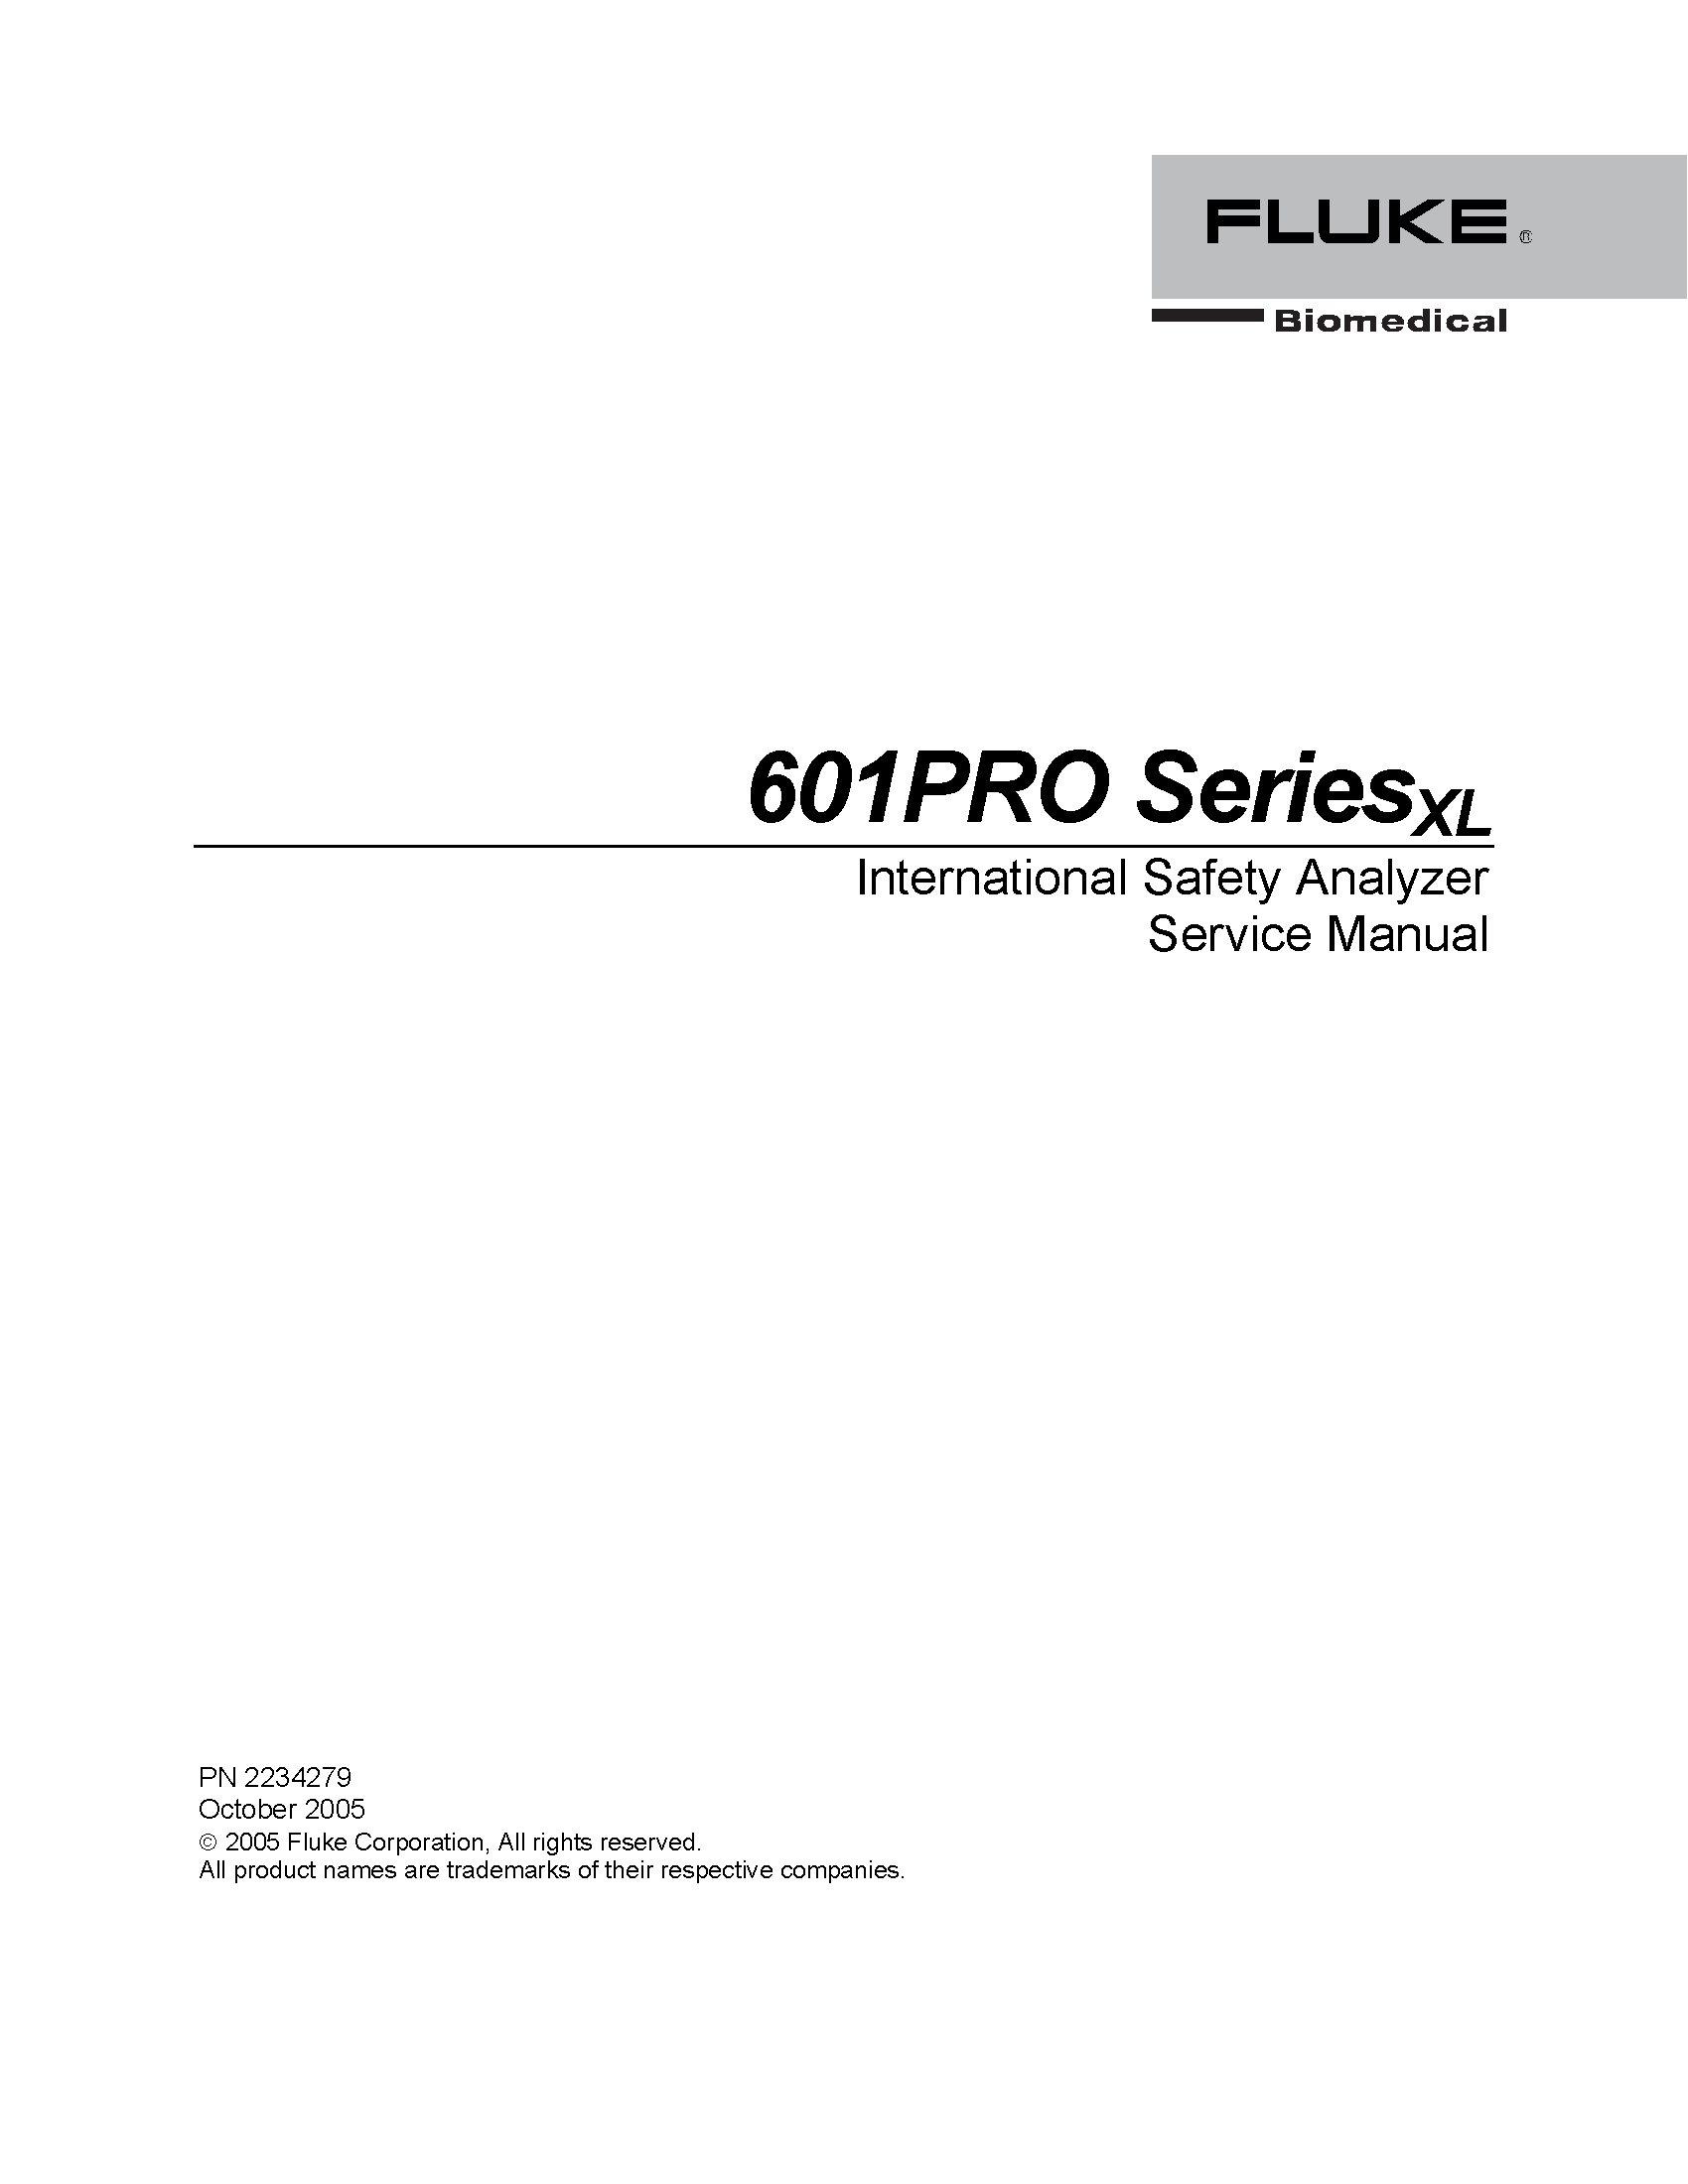 Fluke 601PRO SeriesXL Service Manual